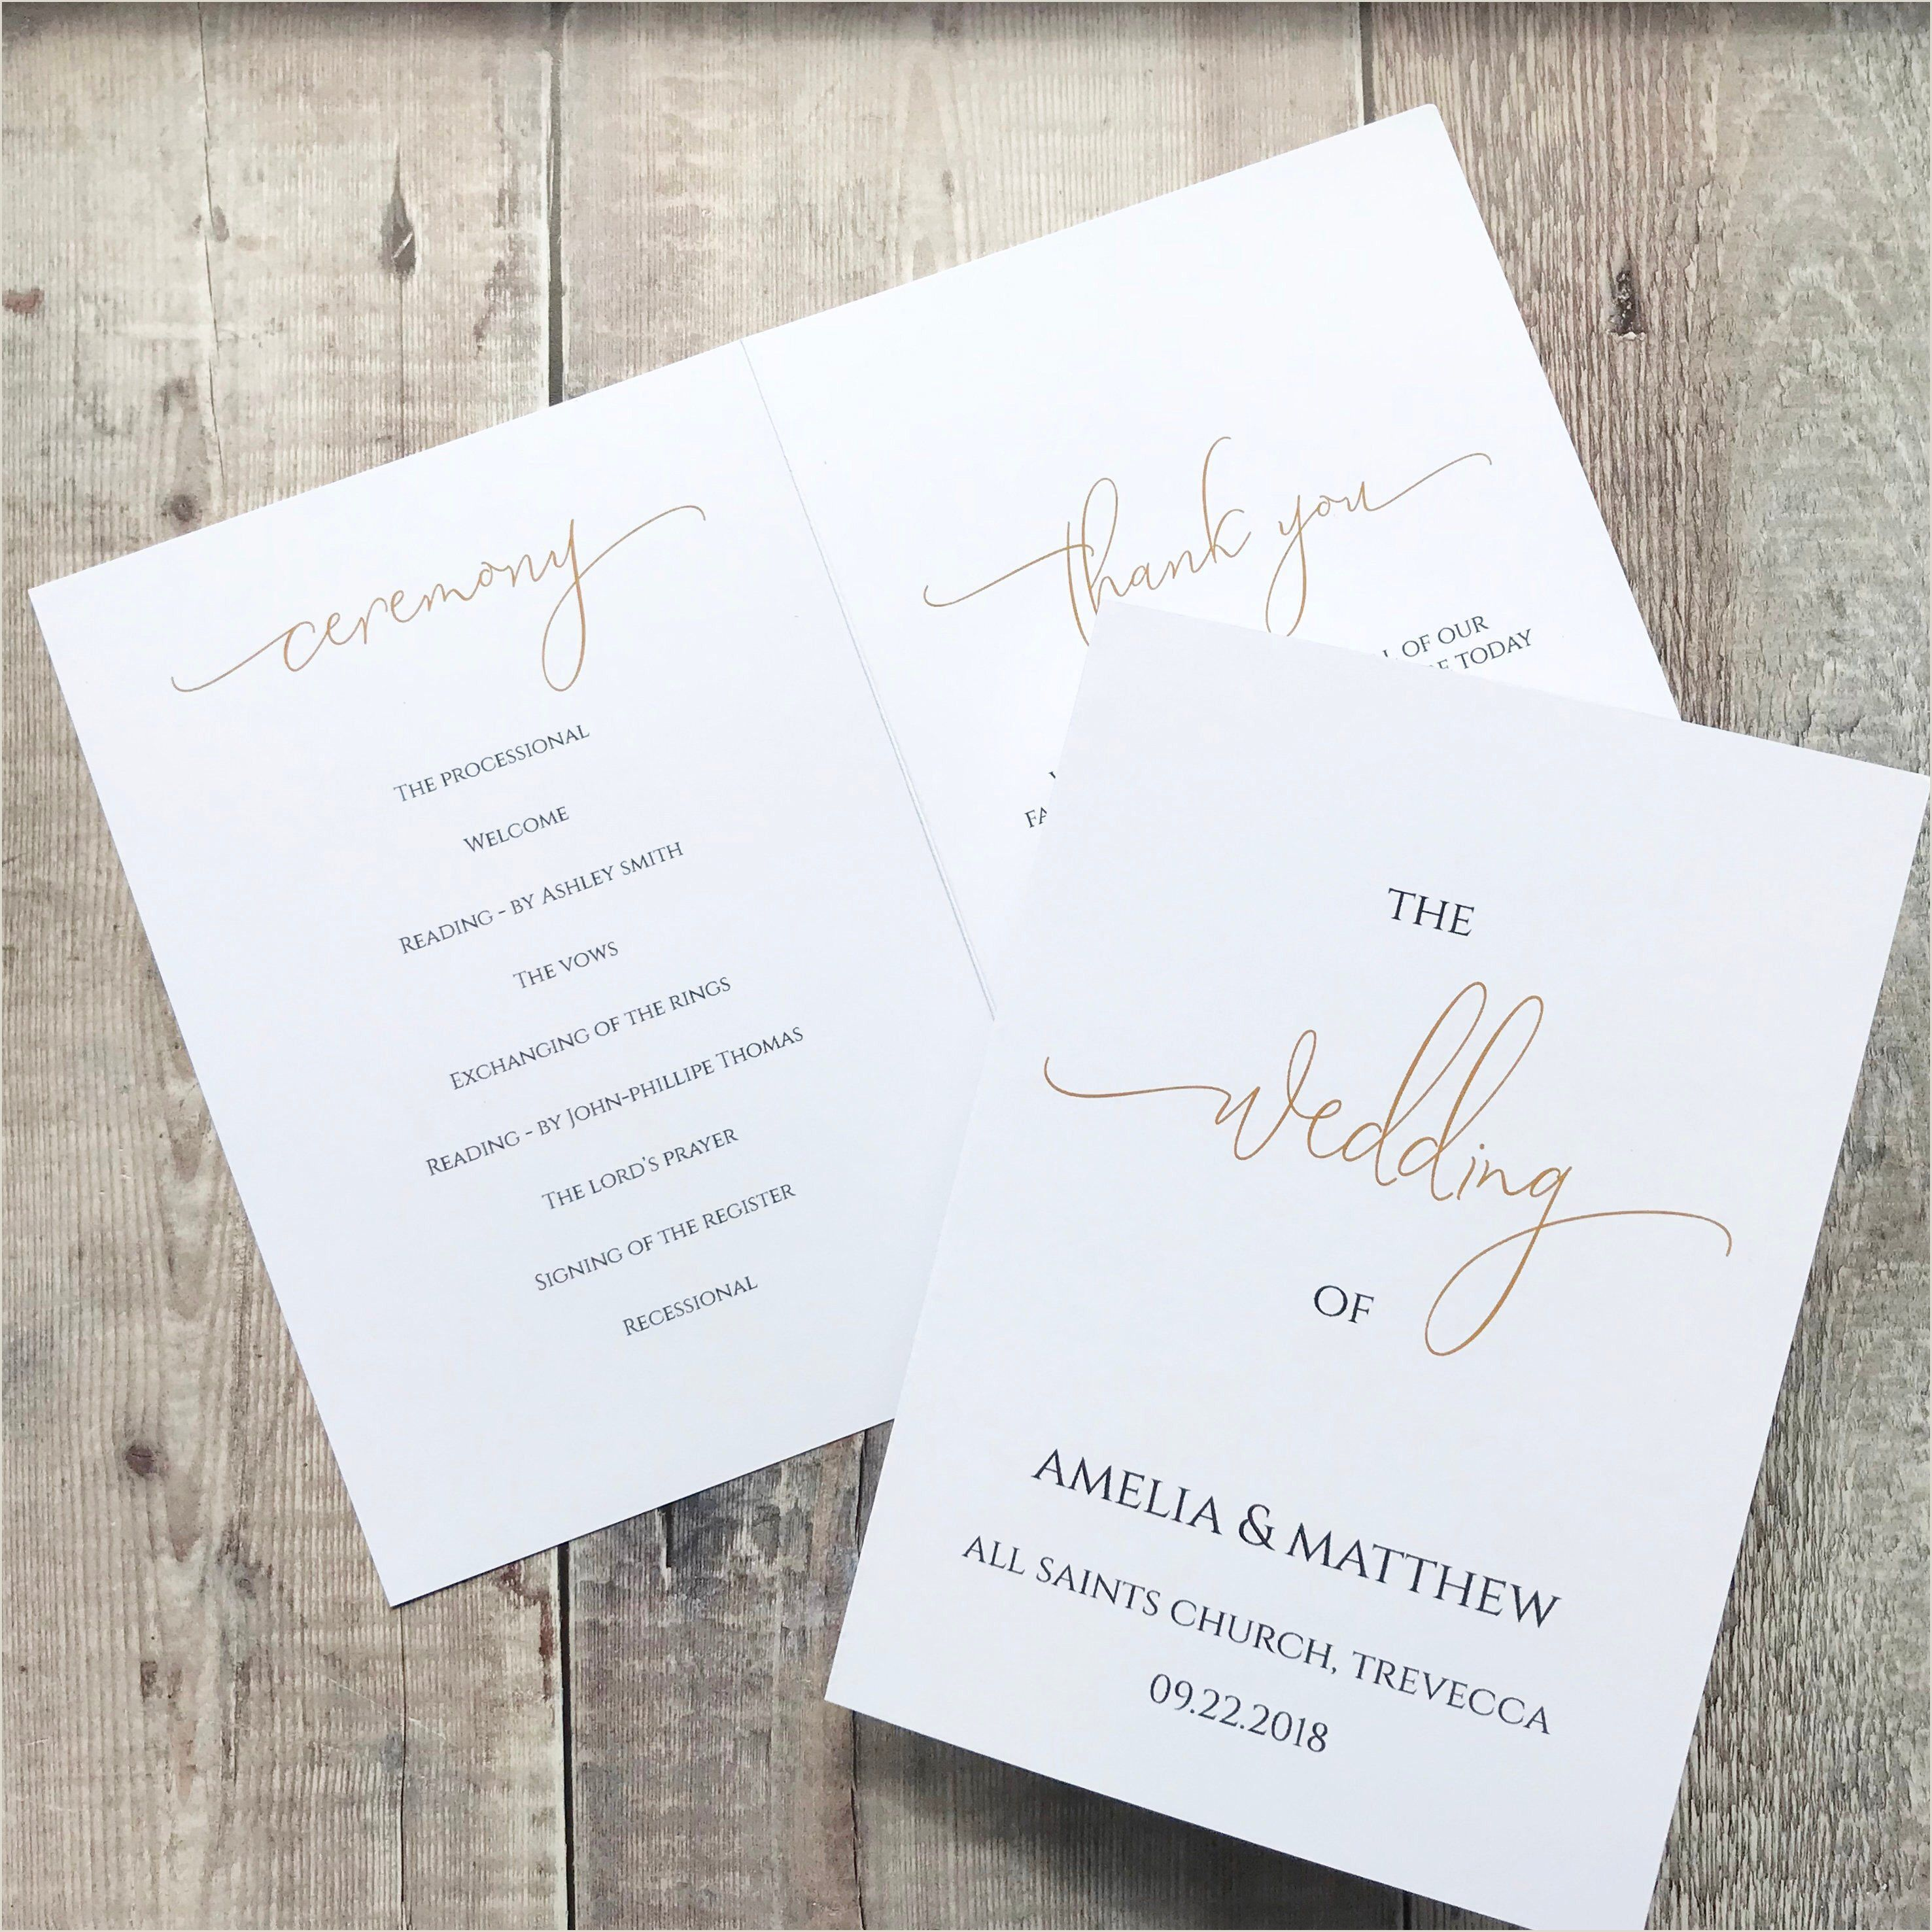 Wedding Program Templates Etsy In 2020 Wedding Programs Template Printable Wedding Program Template Wedding Program Template Free